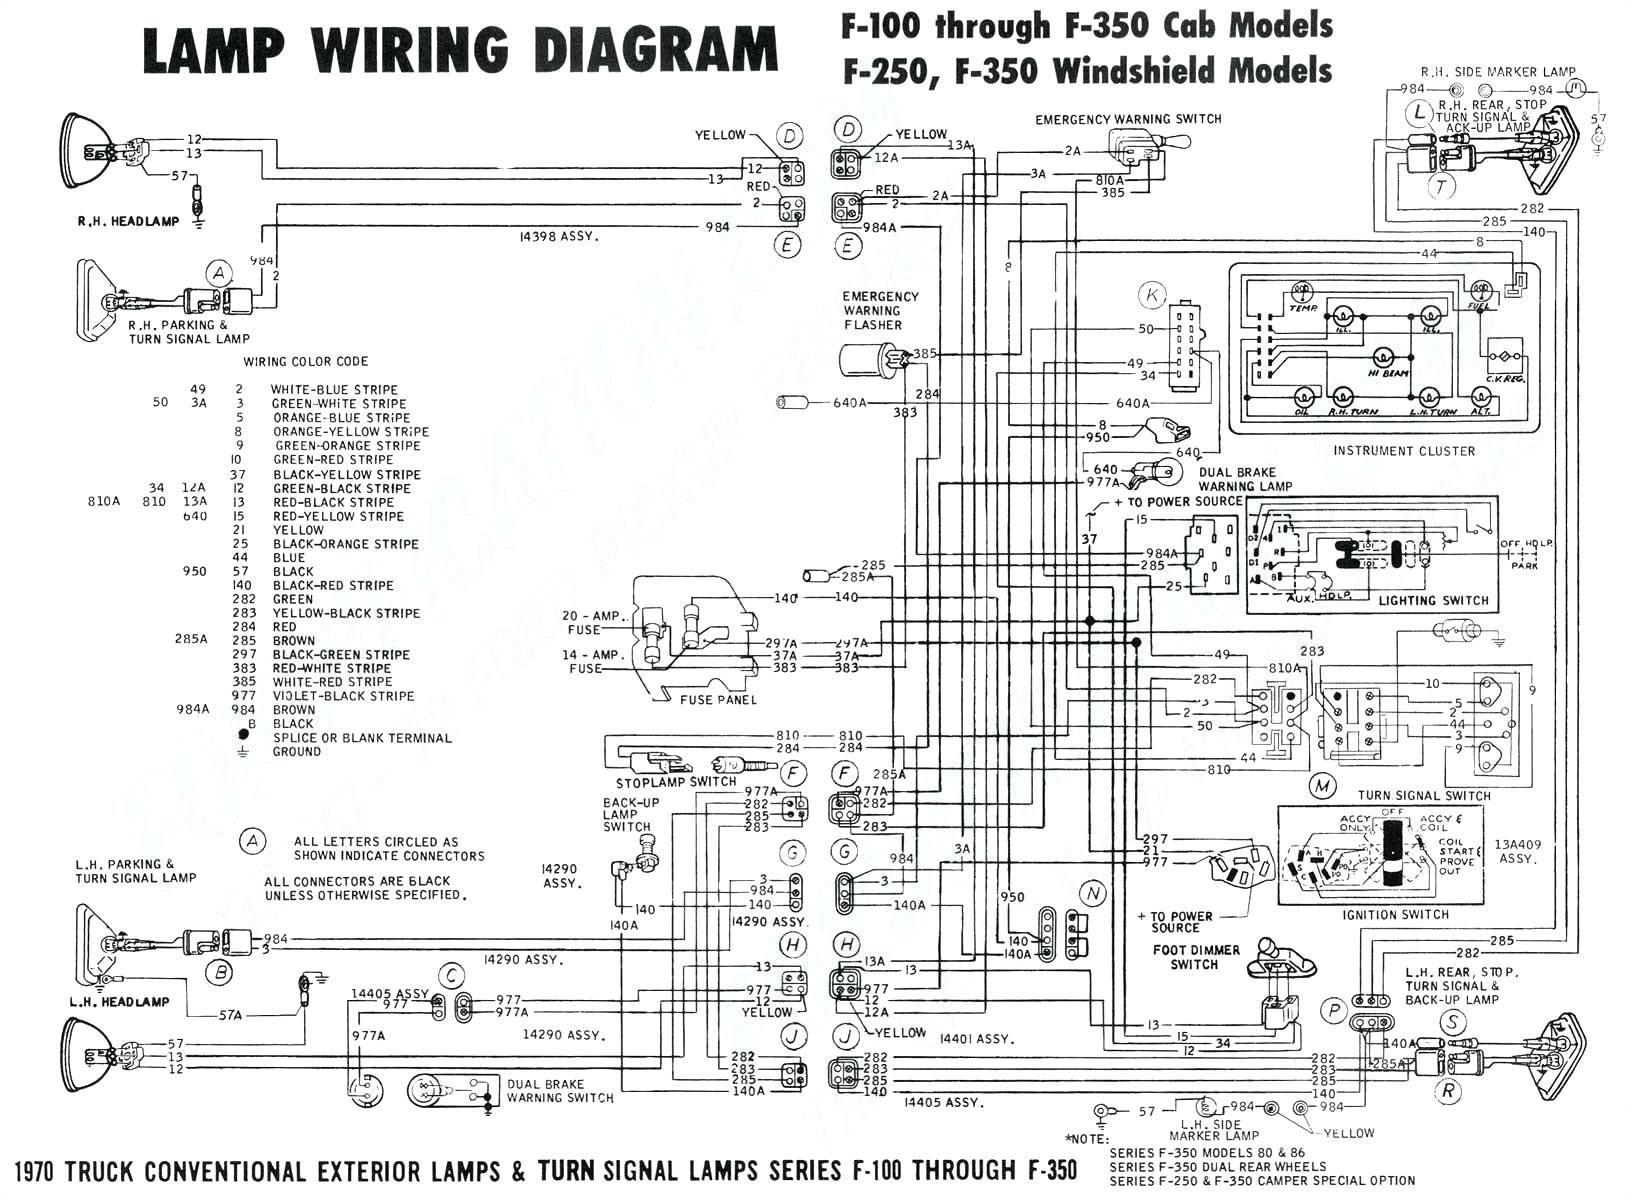 zox wiring diagram wiring diagram supermax wiring diagram wiring diagram postunicell wiring diagram wiring diagram blog